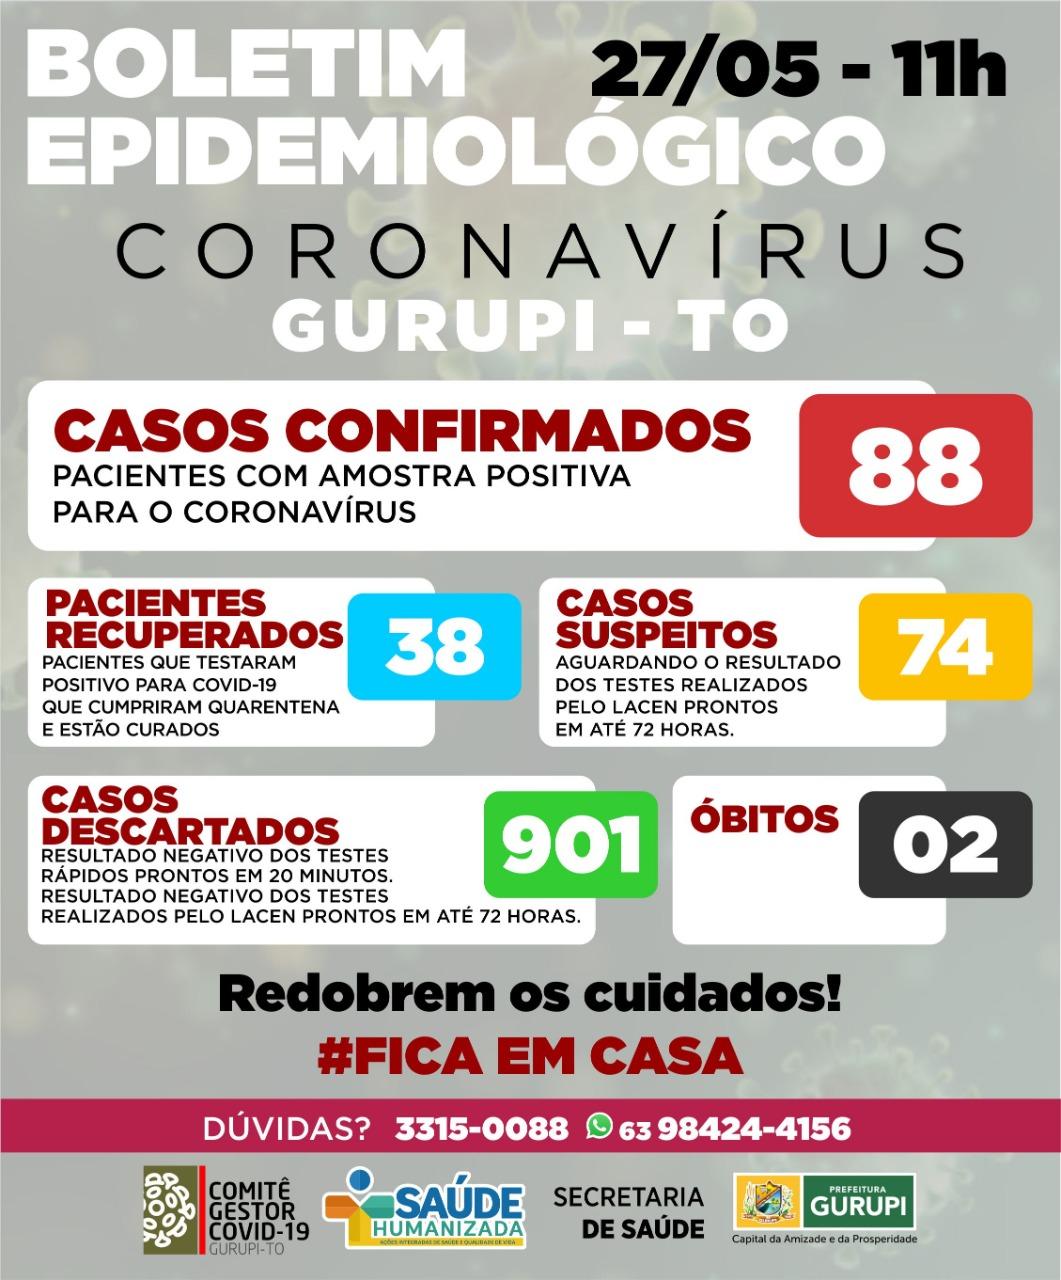 Gurupi tem 2 novos casos positivos para coronavírus e numero de recuperados sobe para 38